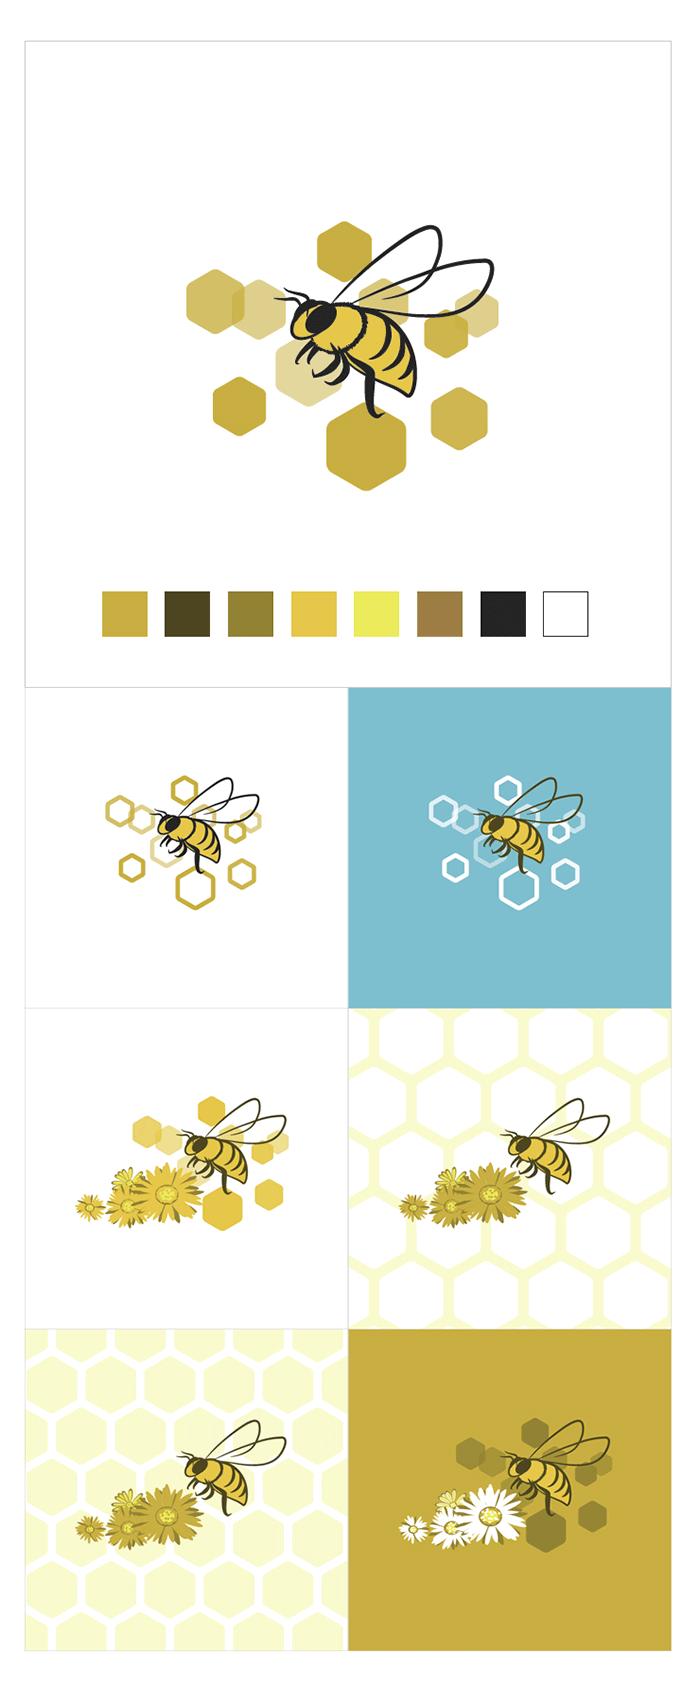 Recherche visuel d'abeille